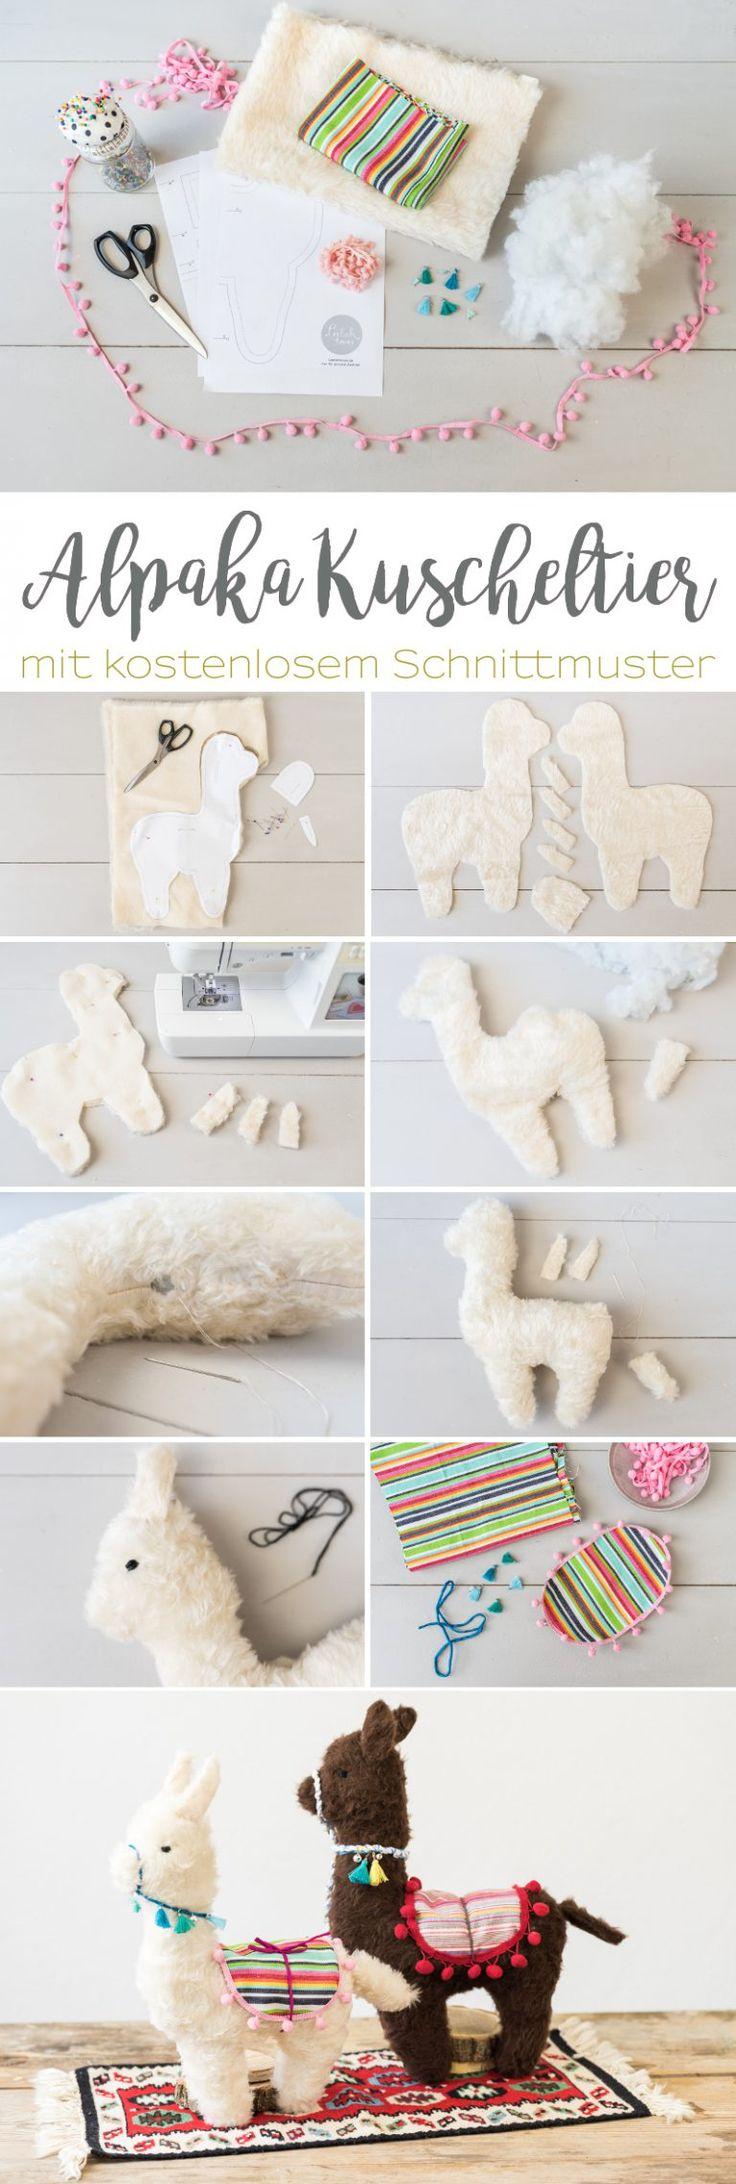 DIY – Geschenke: Alpaka Kuscheltier nähen